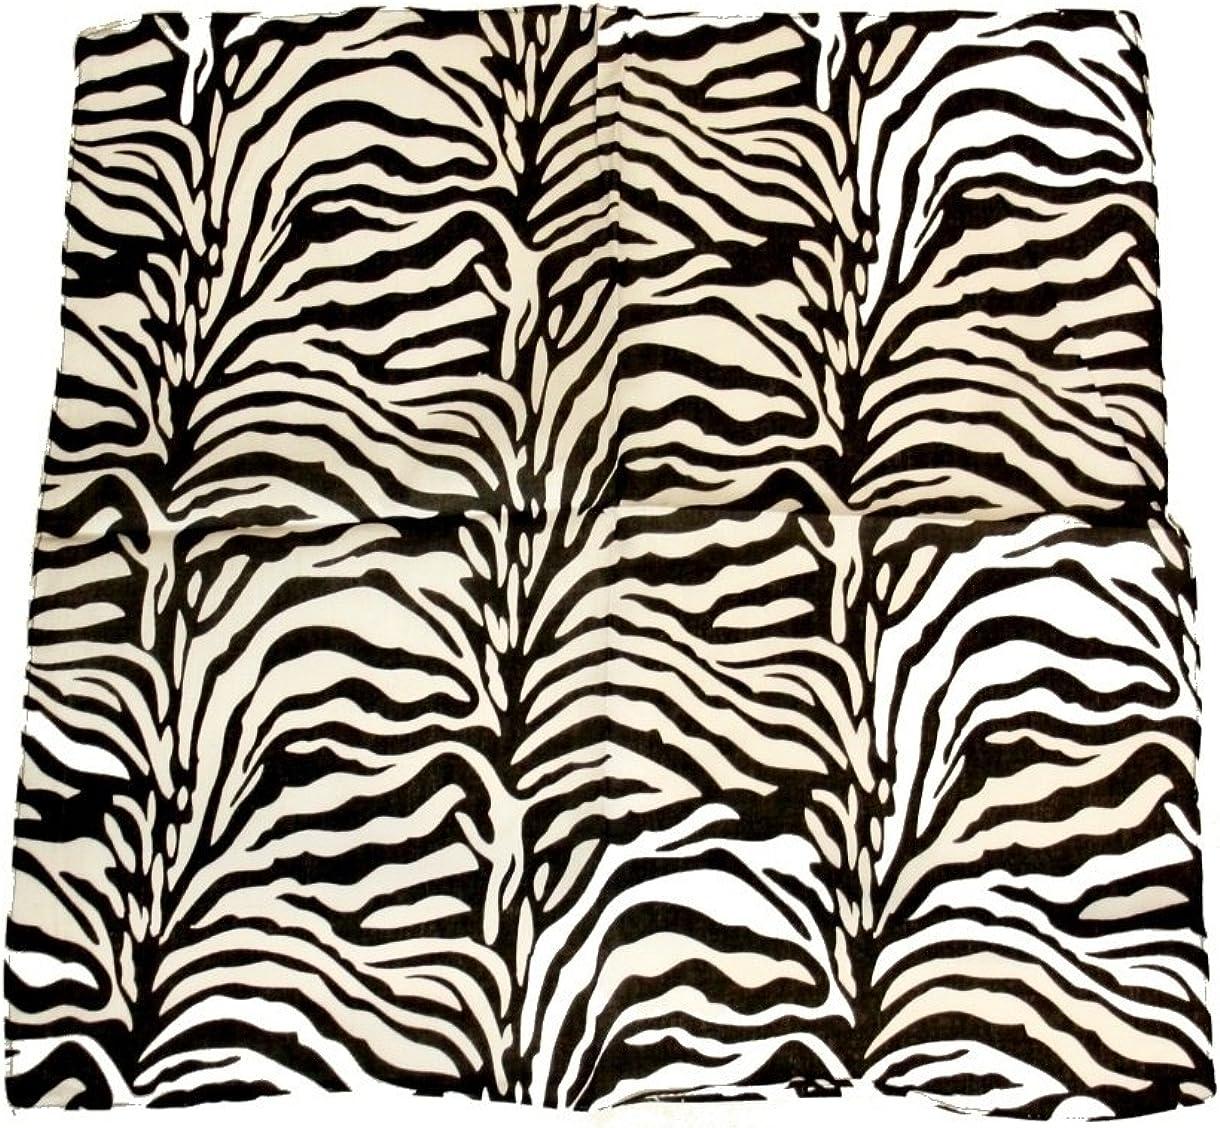 Zacs Alter Ego/® Zebra Print Bandana